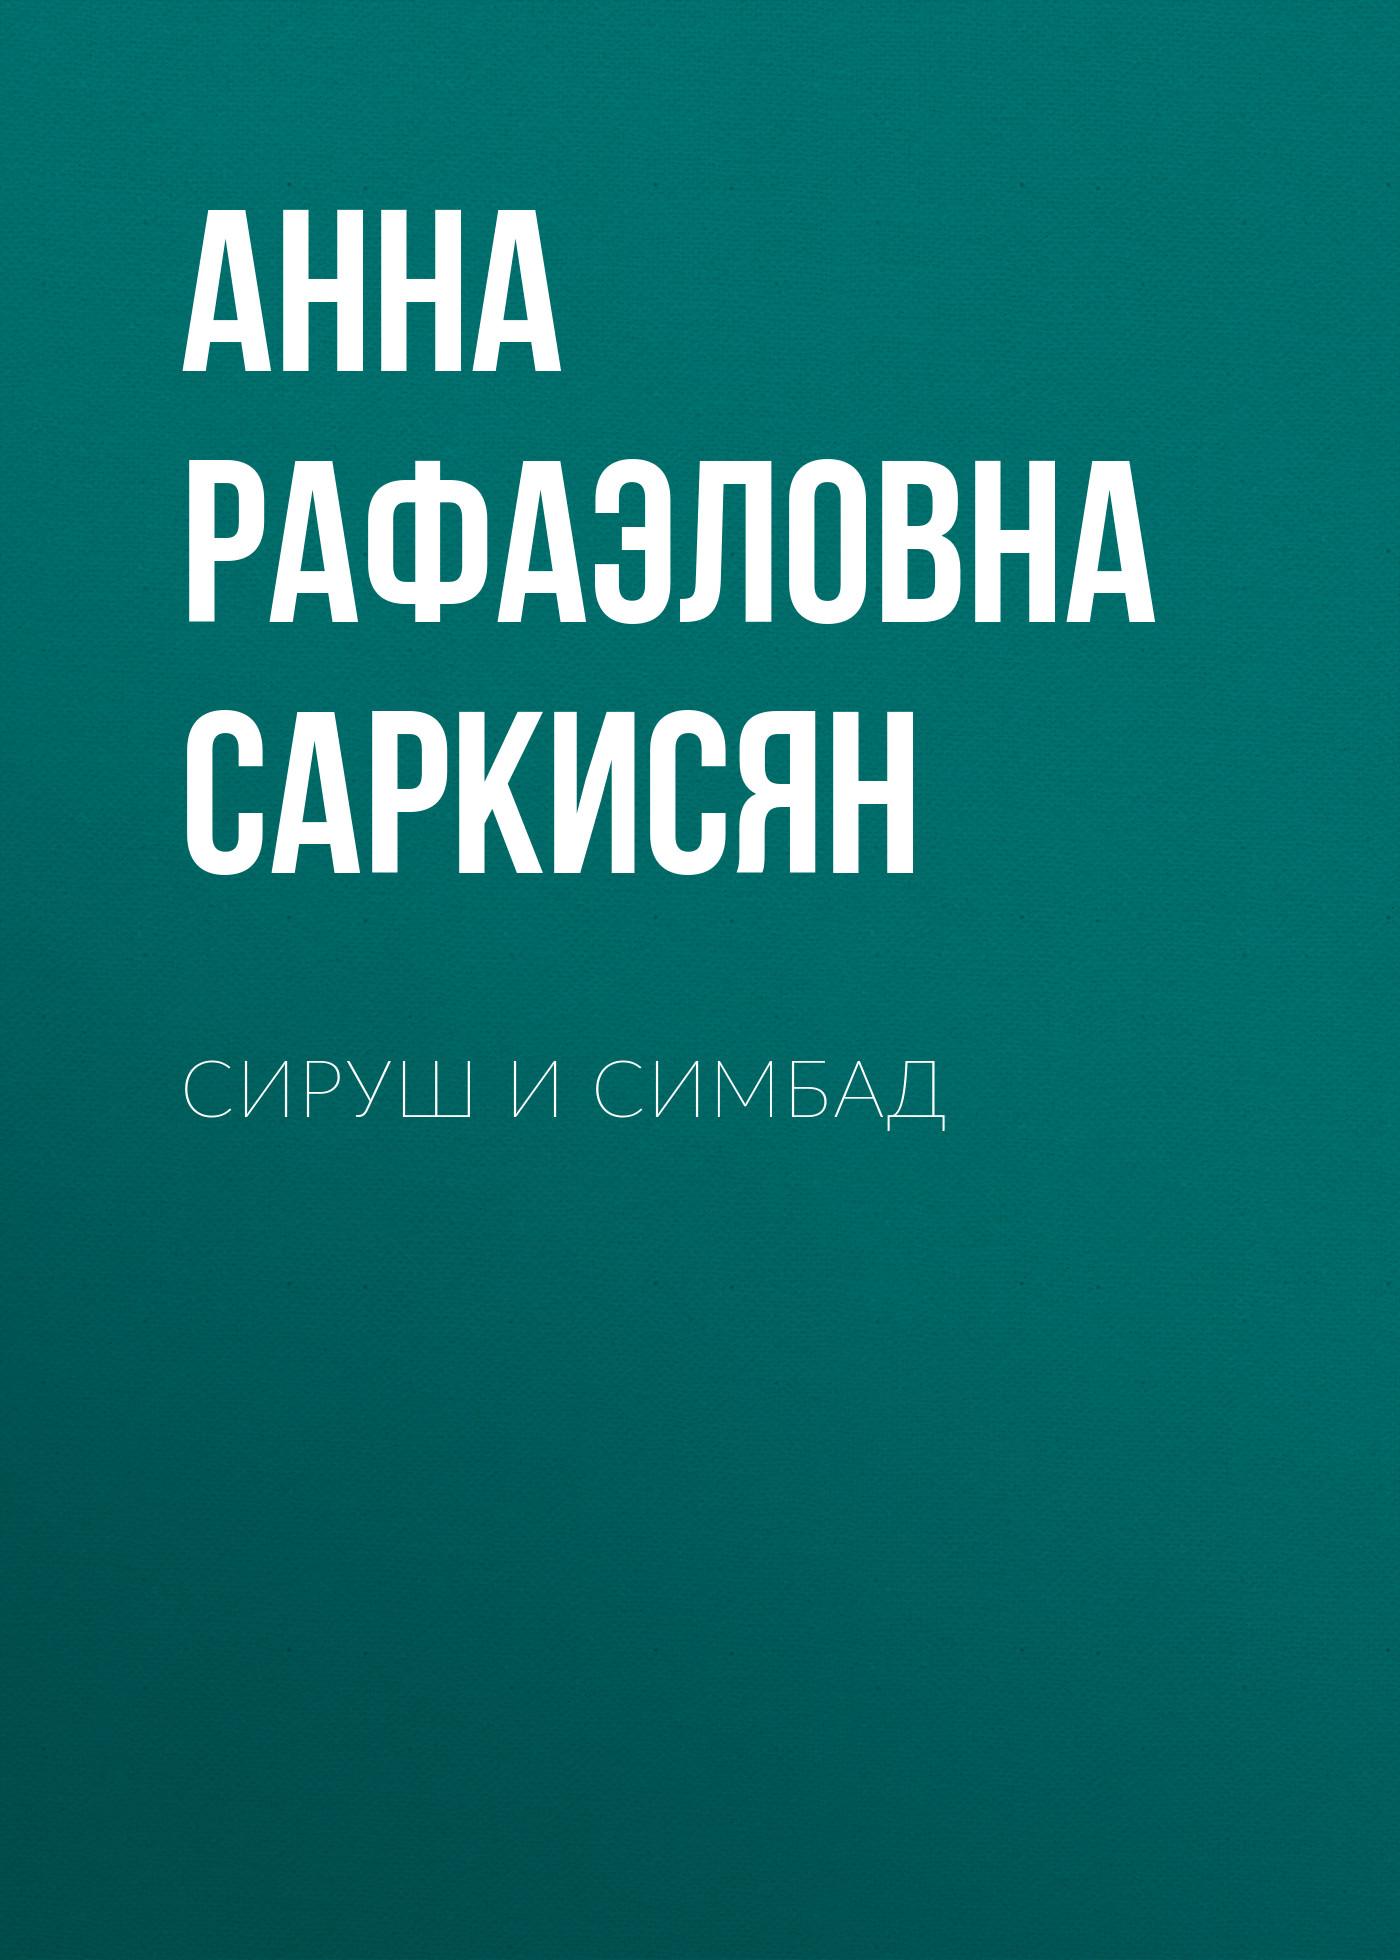 Анна Рафаэловна Саркисян Сируш и Симбад саркисян с вкусное путешествие по армении